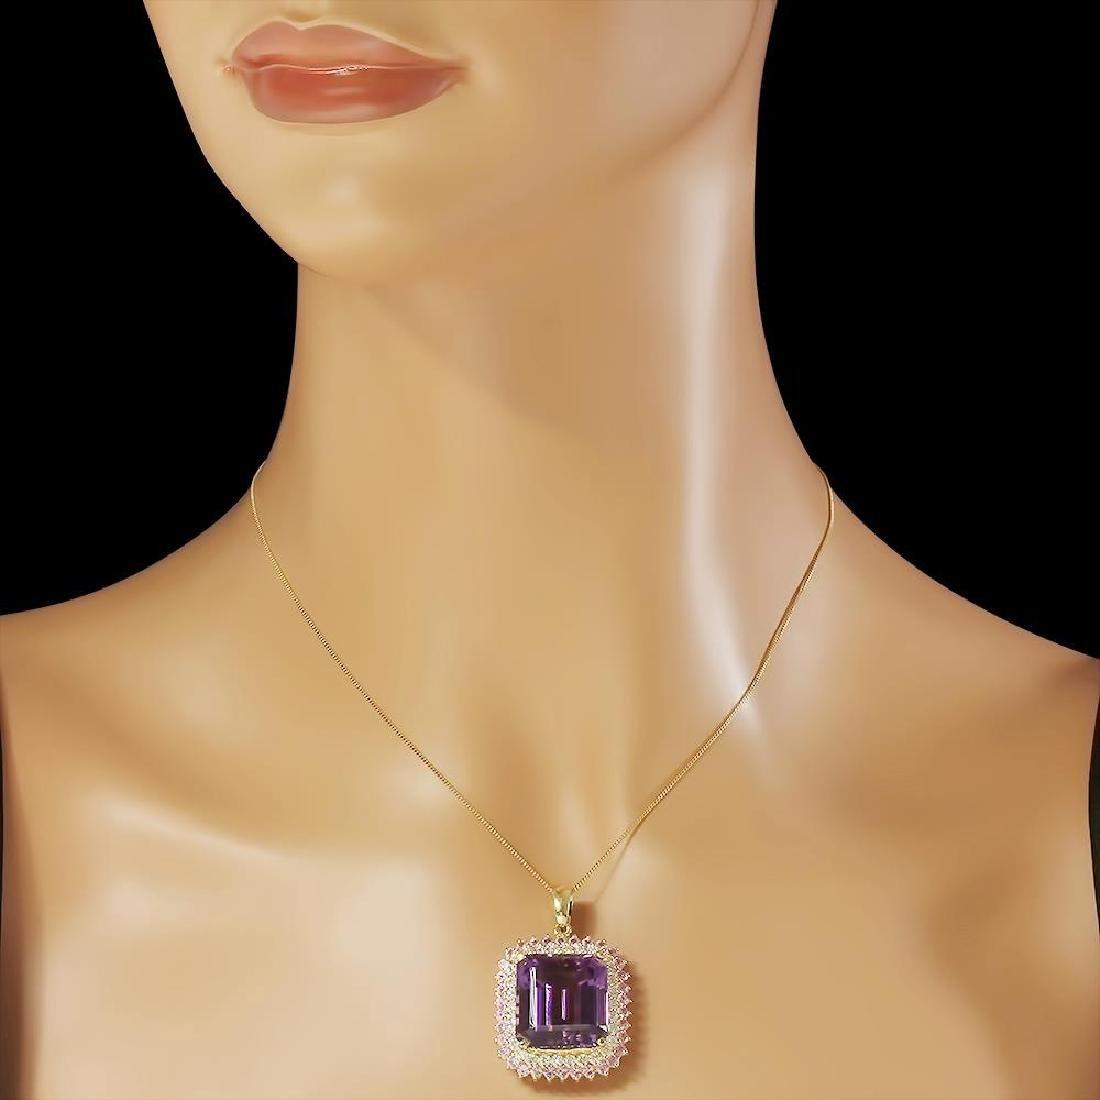 14K Gold 26.16ct Amethyst 2.05ct Sapphire 1.45ct - 3